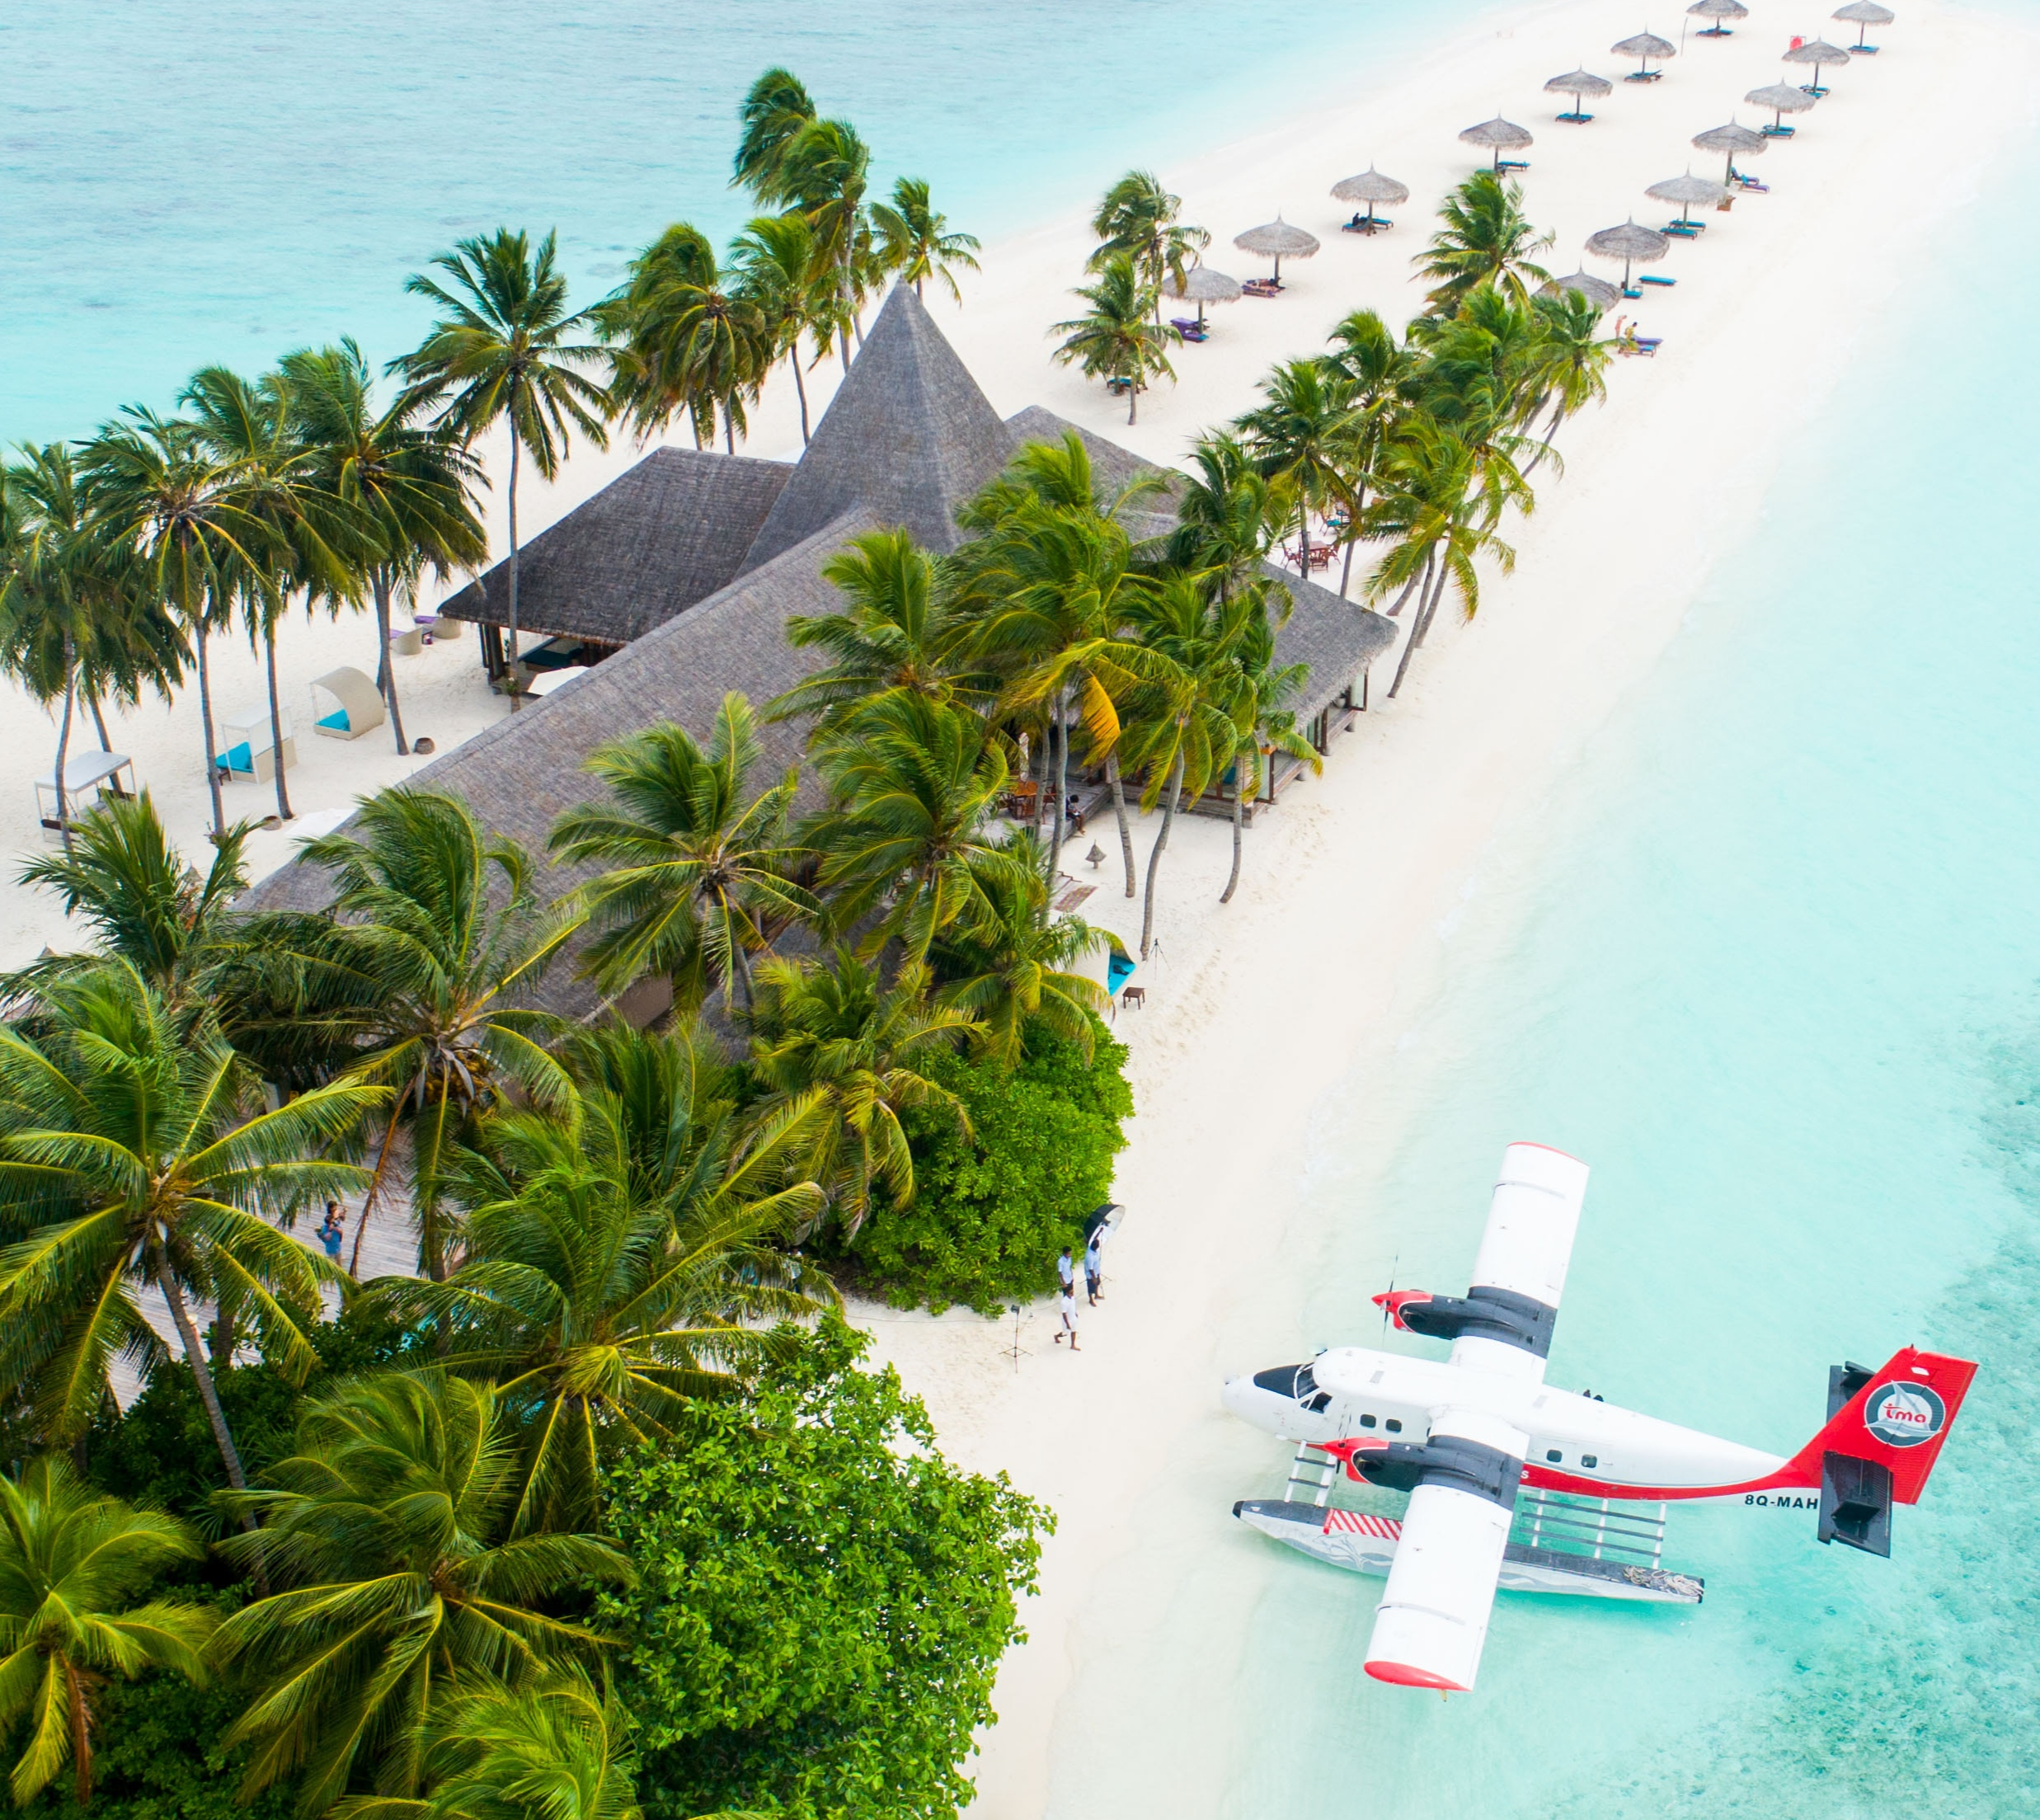 Maldives, Maldives